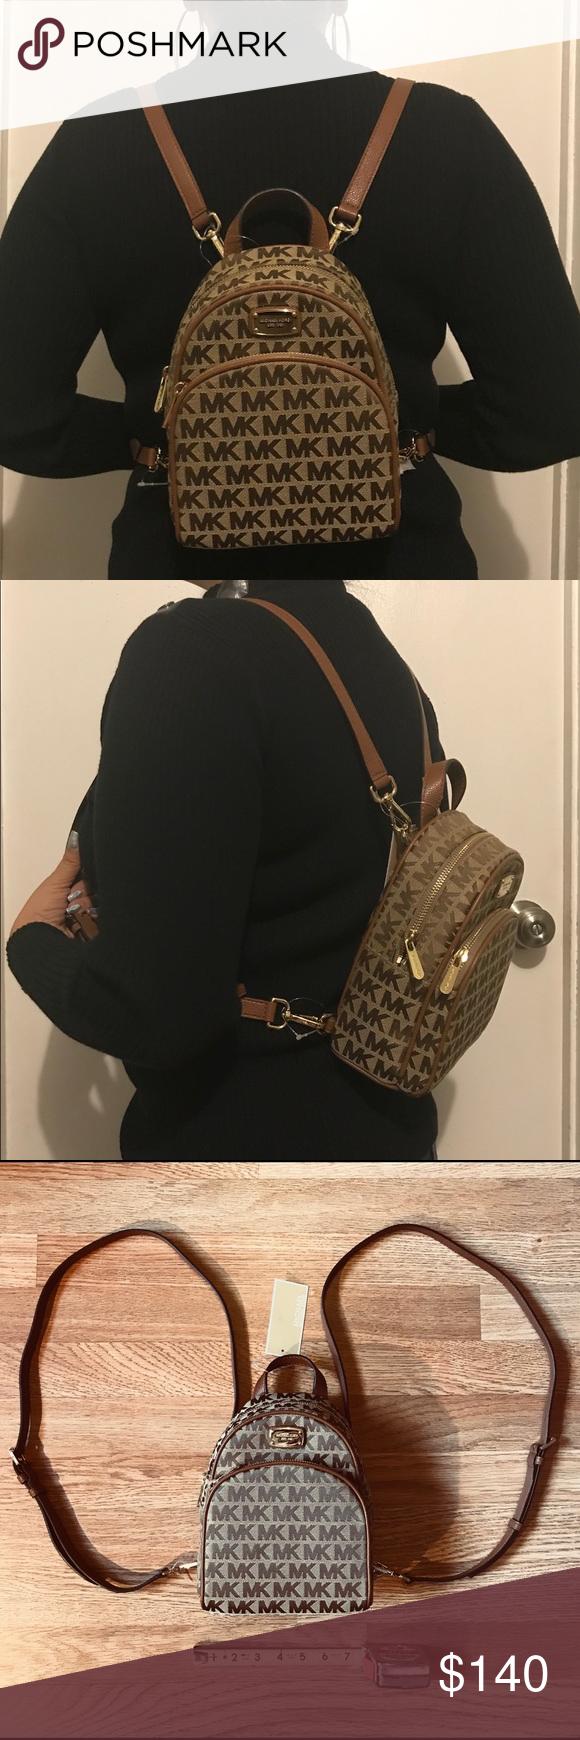 4bdbd7b9fbbf NWT Michael Kors Abbey XS Mini Backpack in Beige Michael Kors Abbey XS  Backpack in Beige • New with tag • 100% authentic • UPC #38H7YAYBOJ •  Approx.